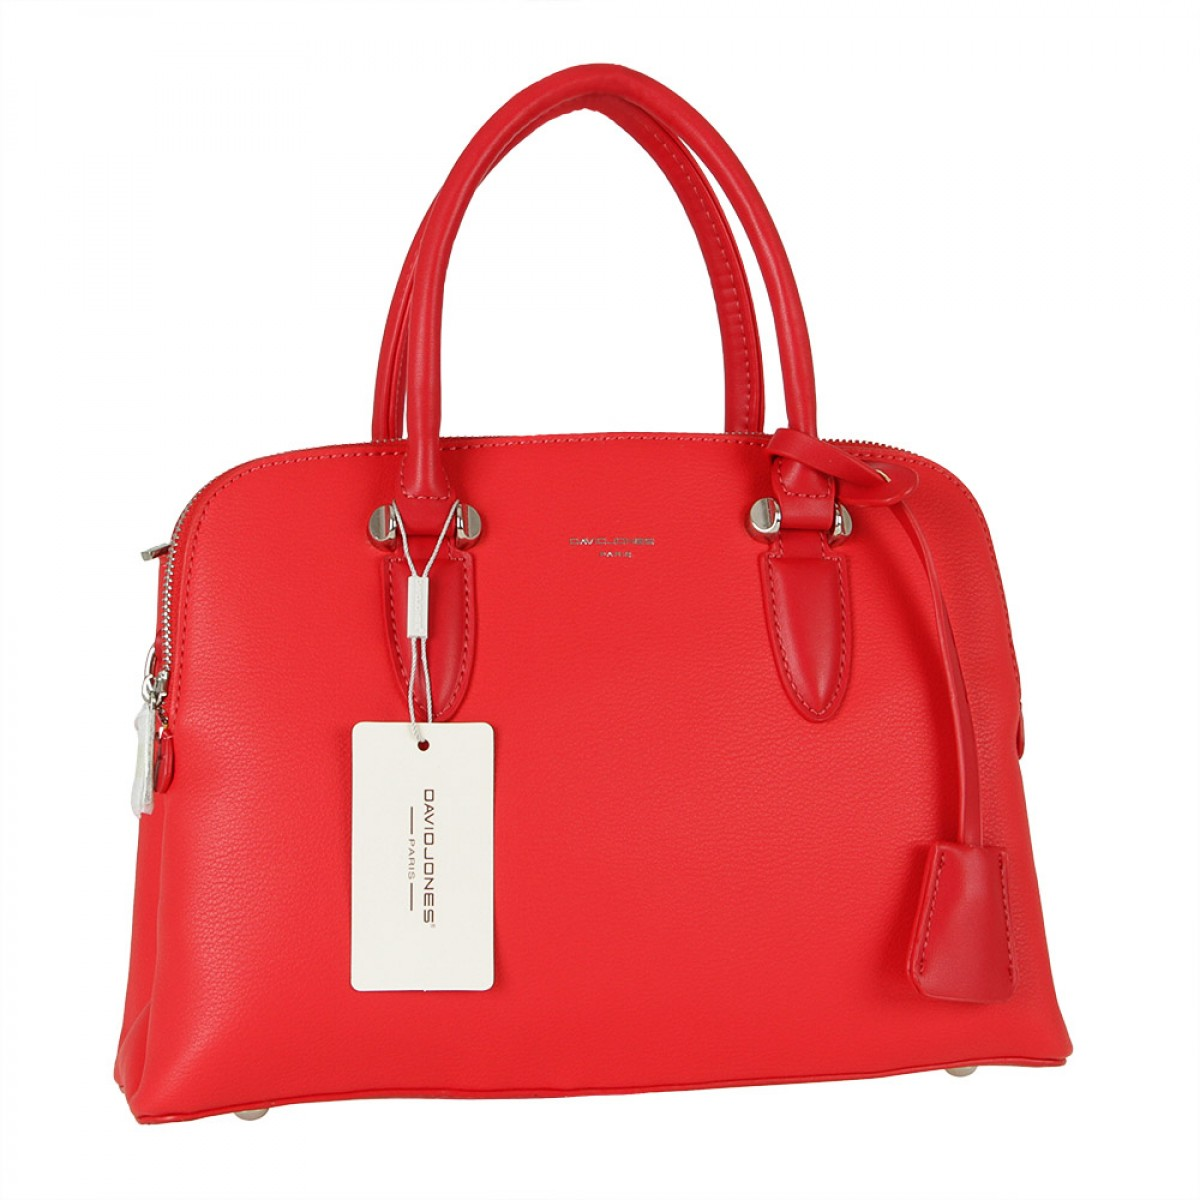 Жіноча сумка David Jones  6207-1A RED